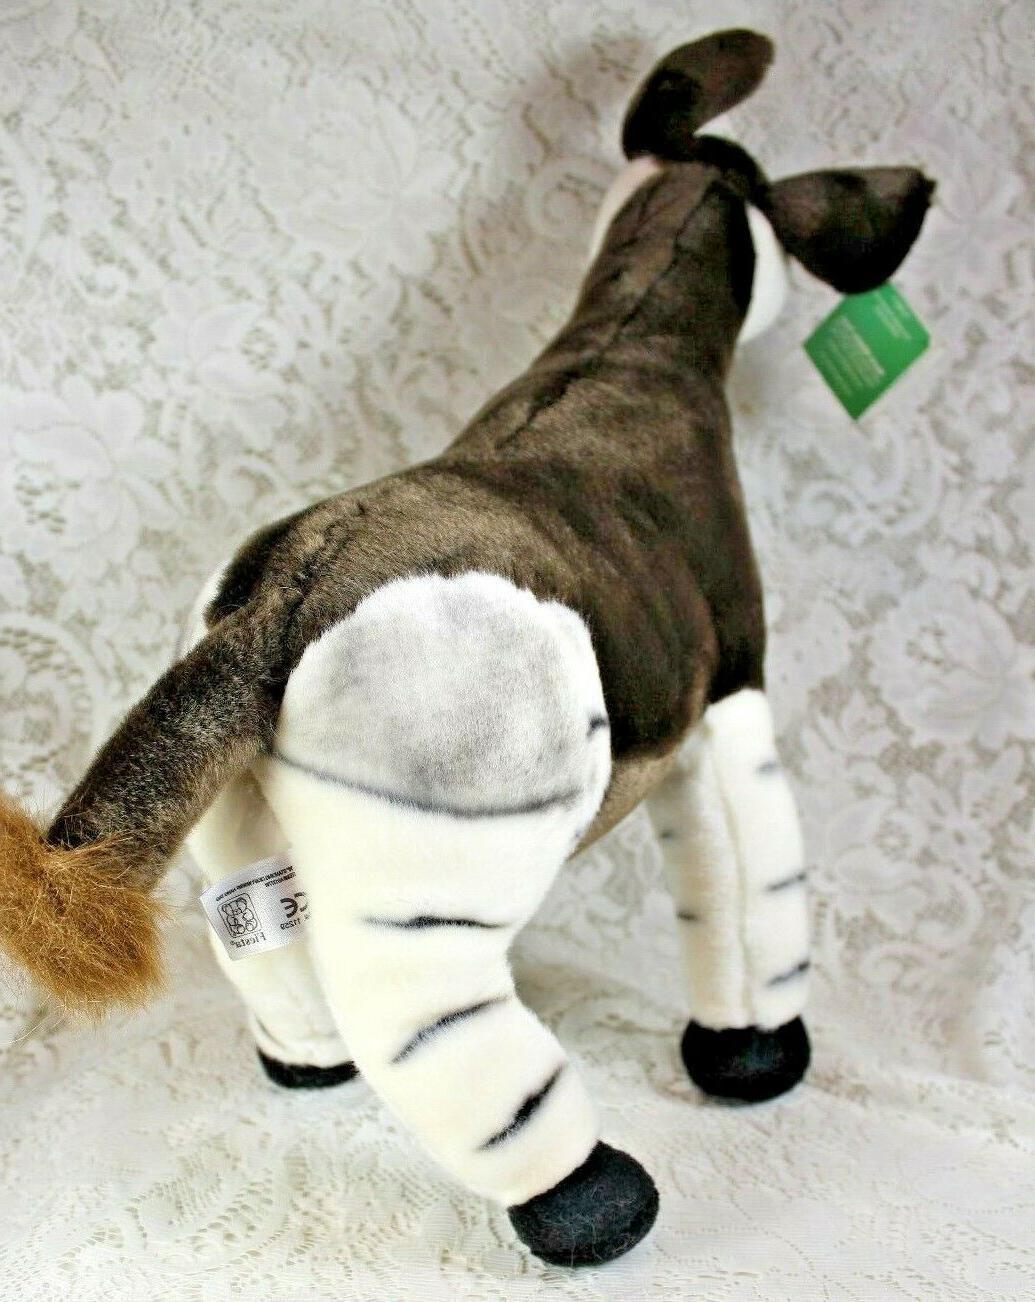 FIESTA OKAPI Plush Stuffed Animal Toy Poseable